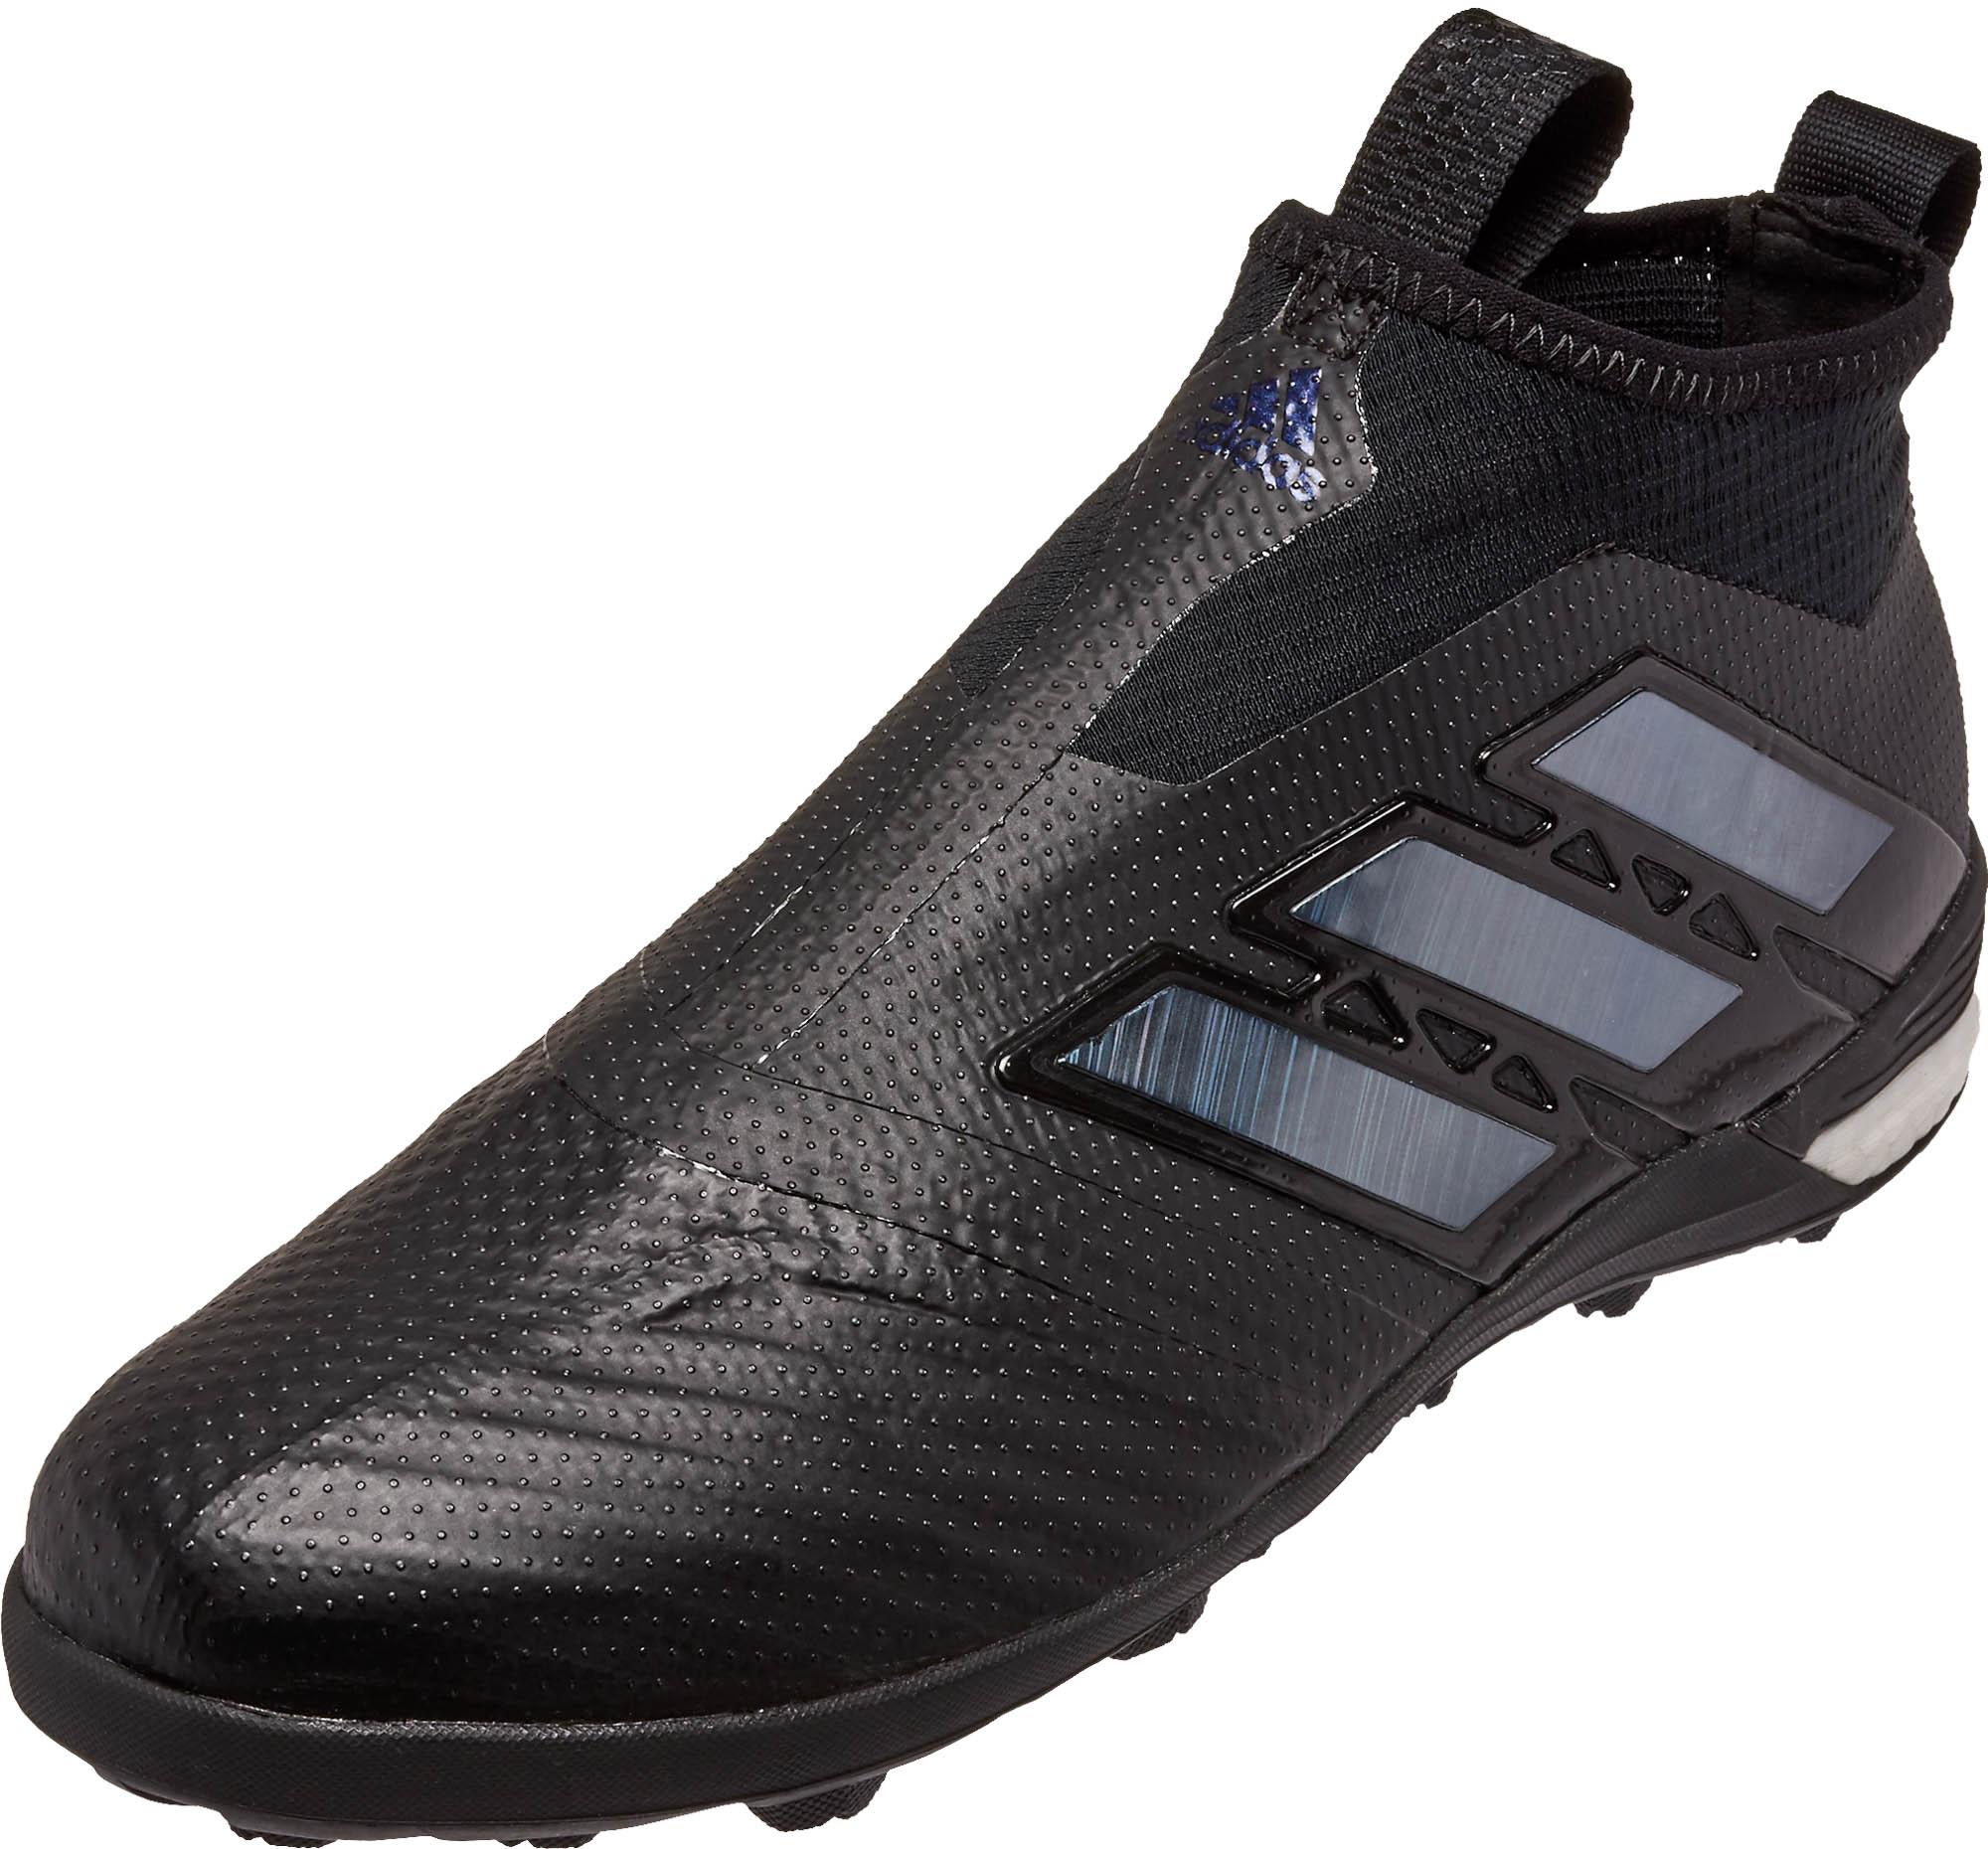 adidas ace tango 17 purecontrol tf soccer shoes black. Black Bedroom Furniture Sets. Home Design Ideas